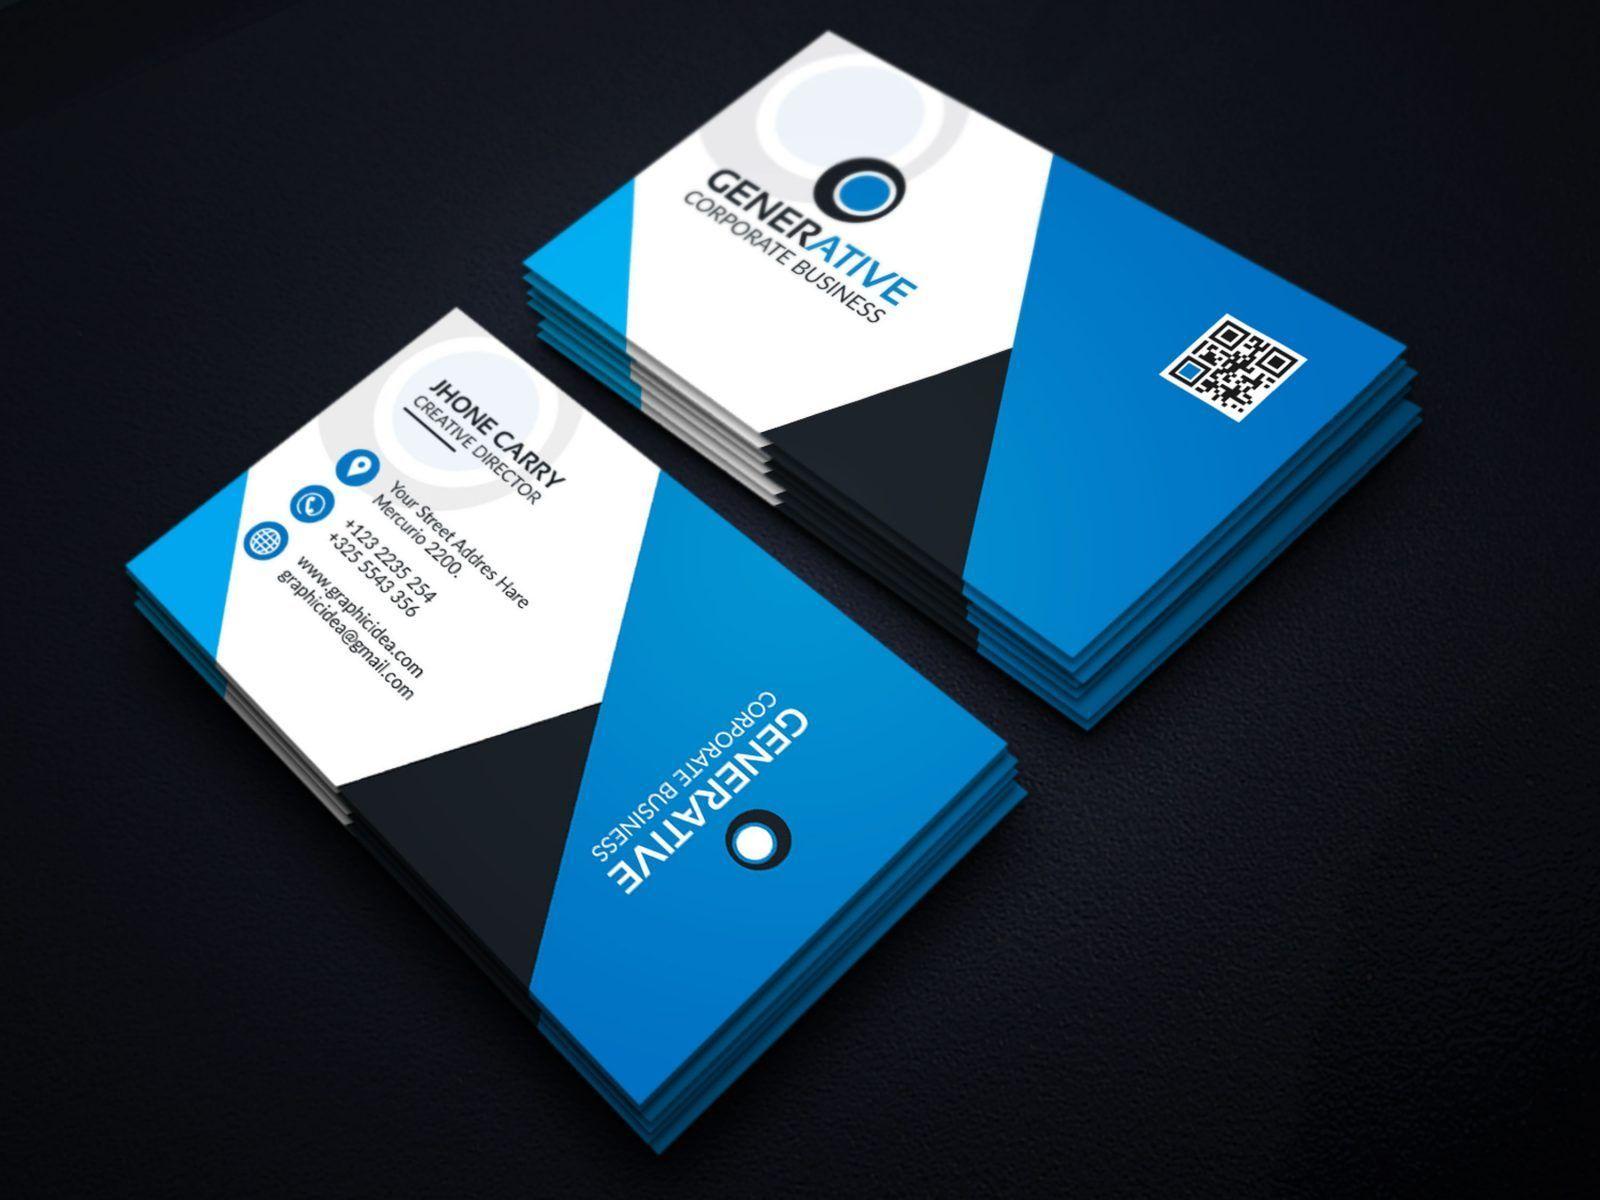 Eps Sleek Business Card Design Template 001599 Template Catalog Business Card Design Business Card Template Design Stylish Business Cards